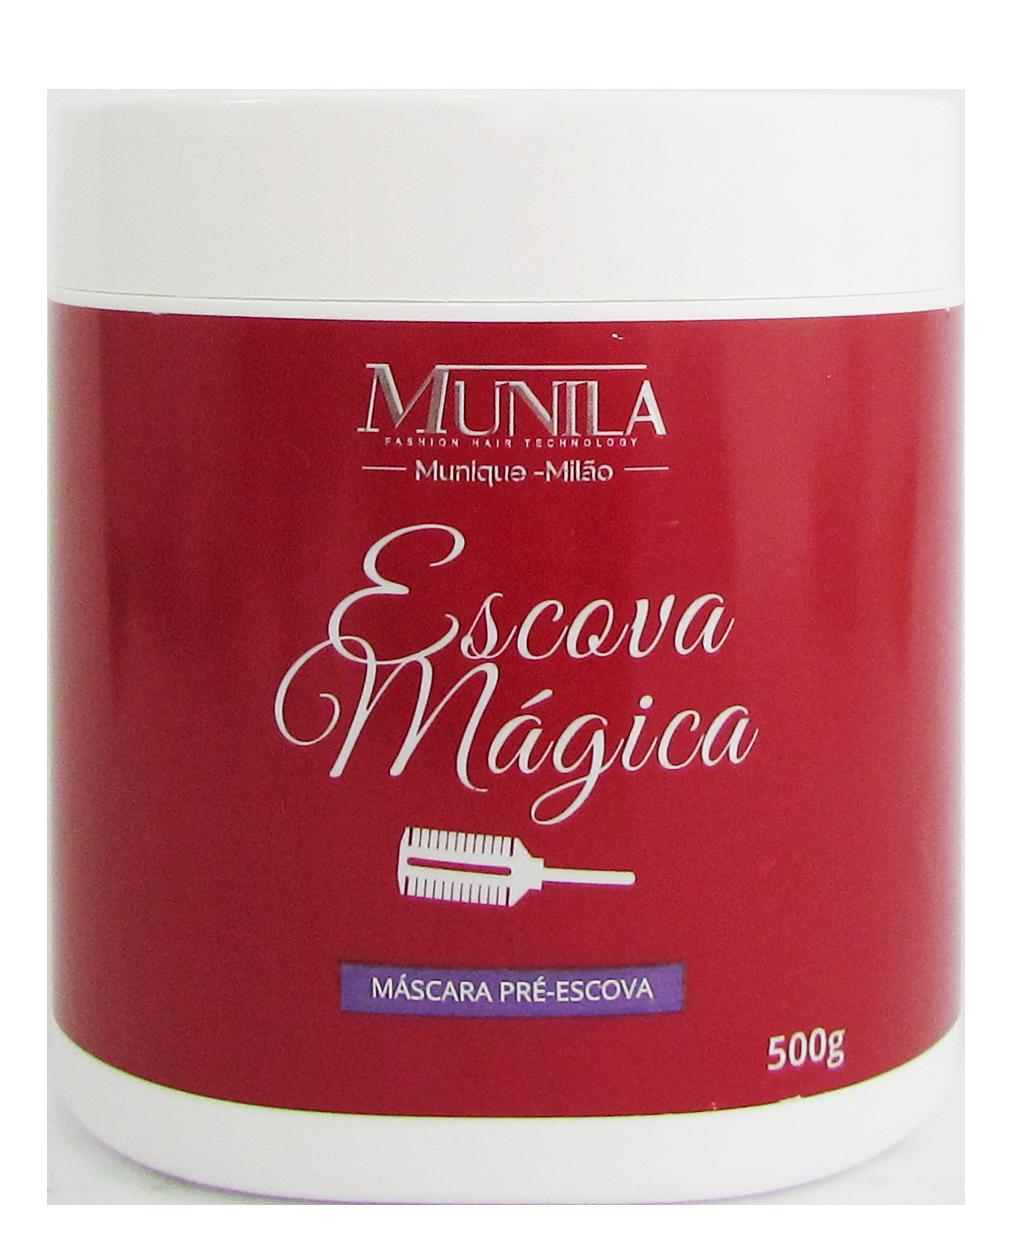 Escova Magica Mascara 500g